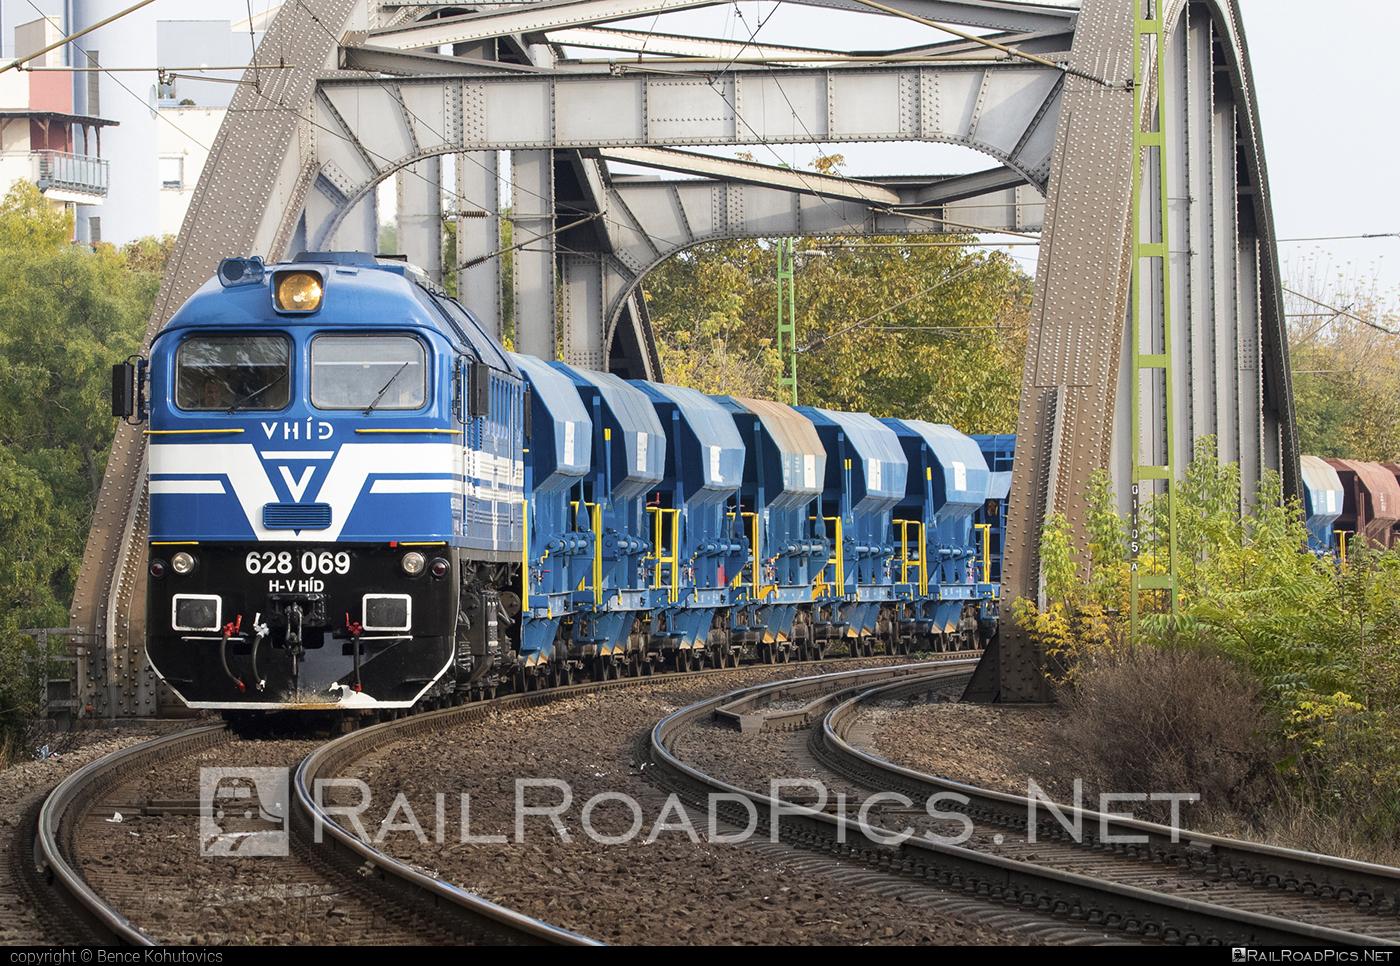 Lugansk M62 - 628 069-0 operated by V-HÍD Vagyonkezelő Kft. #hopperwagon #locomotivem62 #ltz #ltzm62 #lugansk #luganskteplovoz #luhansklocomotiveworks #luhanskm62 #luhanskteplovoz #m62 #m62locomotive #vhid